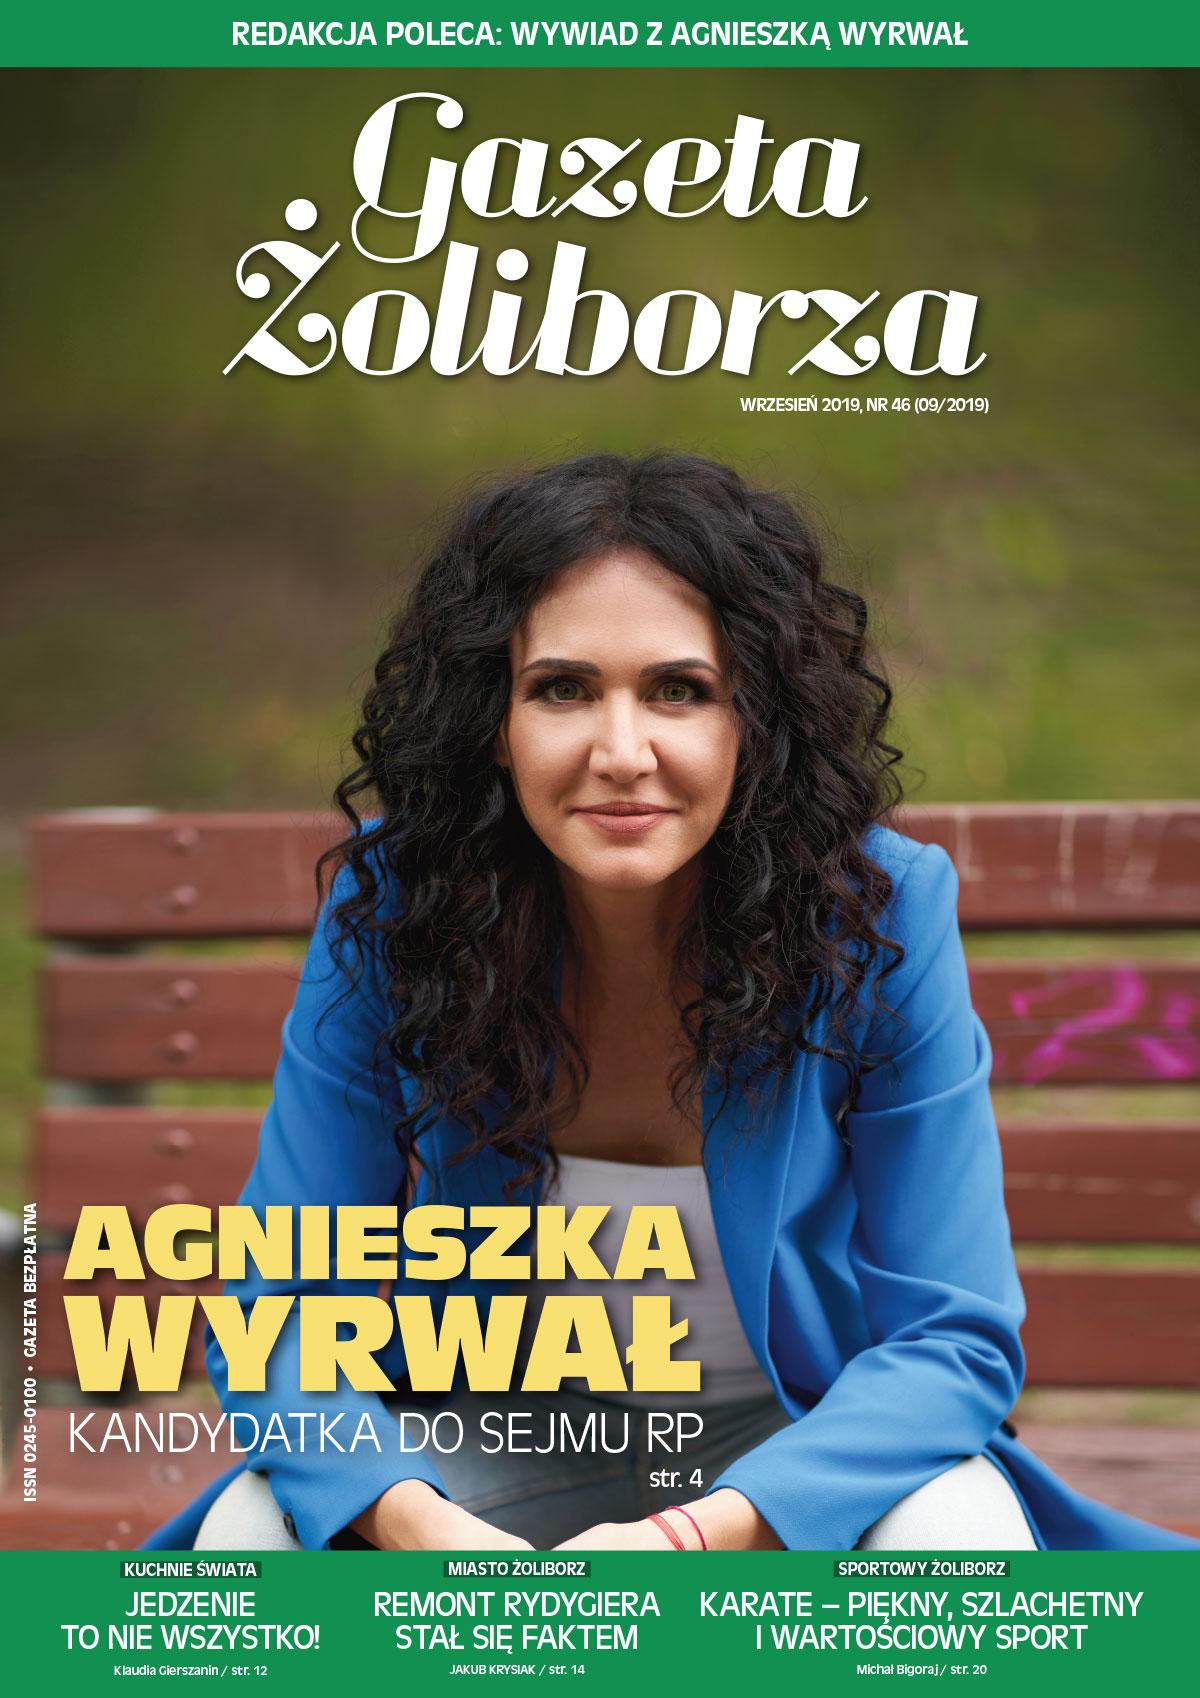 Gazeta Żoliborza - 09/2019 (46)